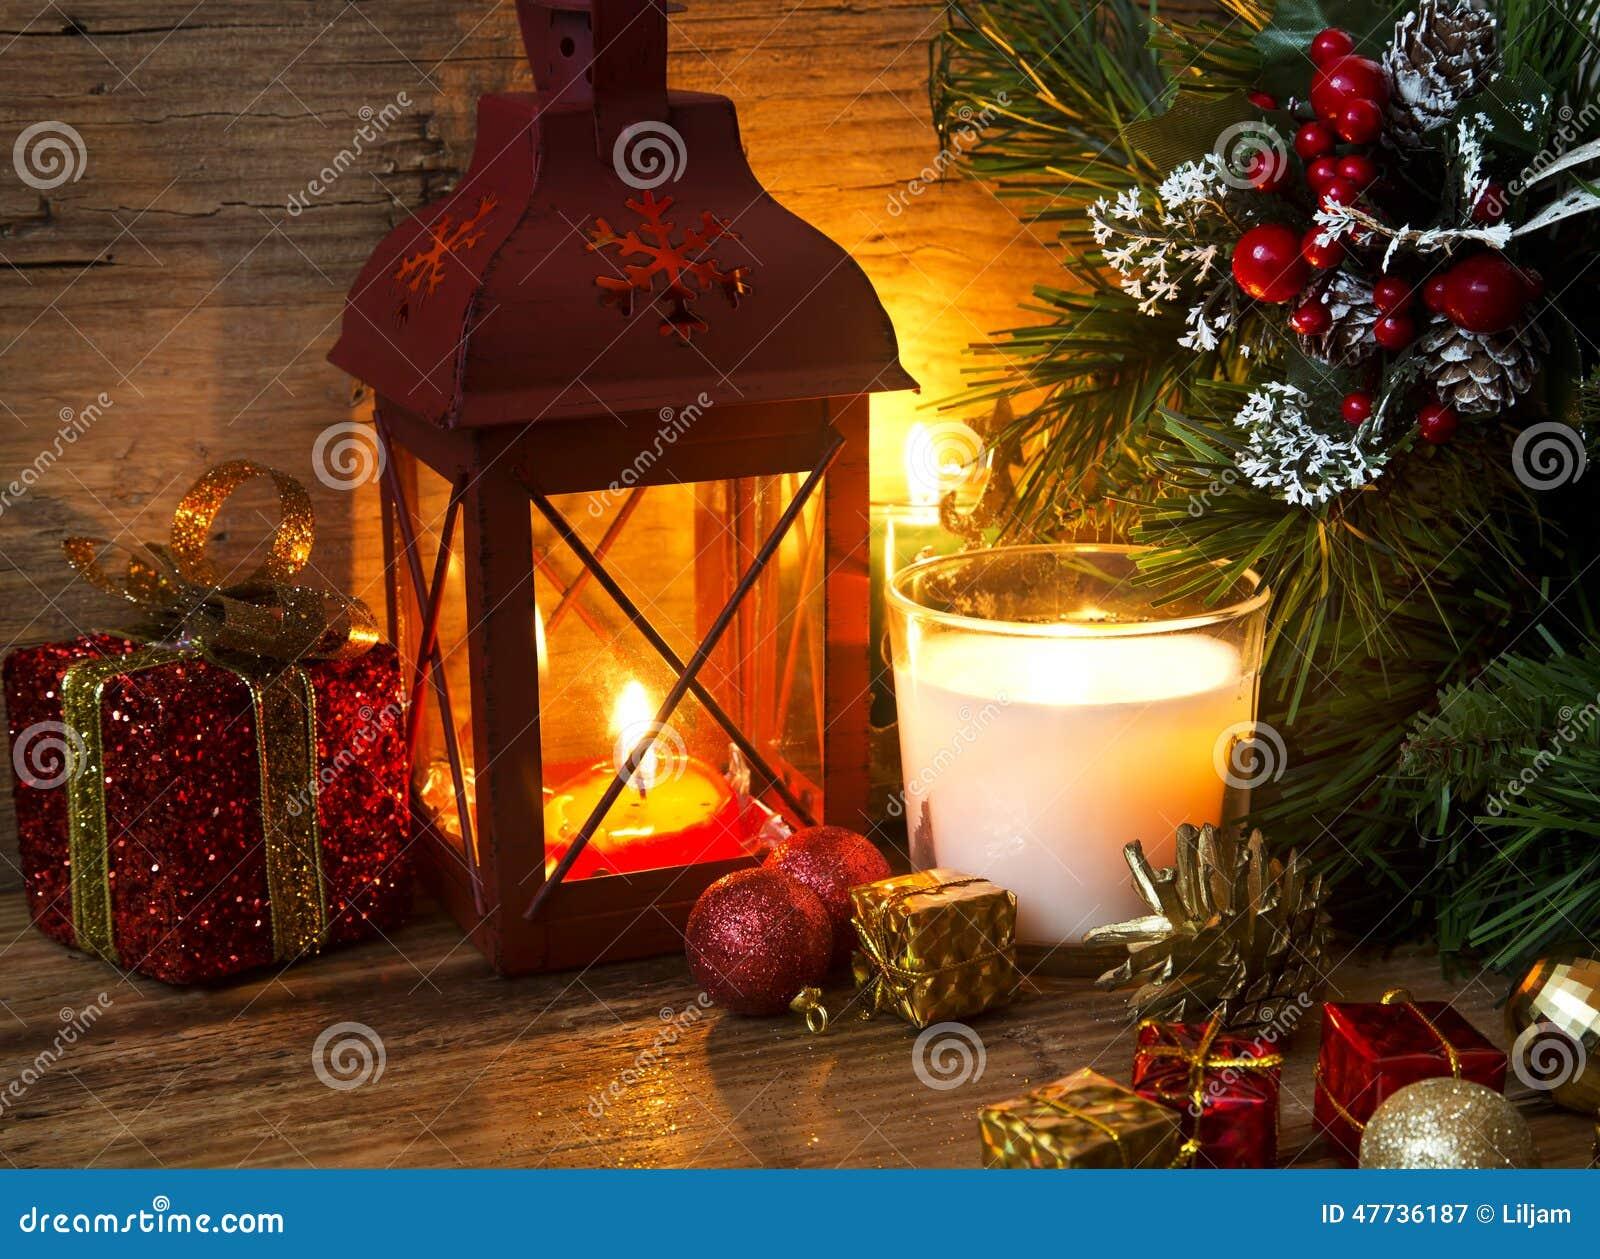 Decorare Candele Di Natale : Lanterna magica di natale con le candele e le decorazioni immagine